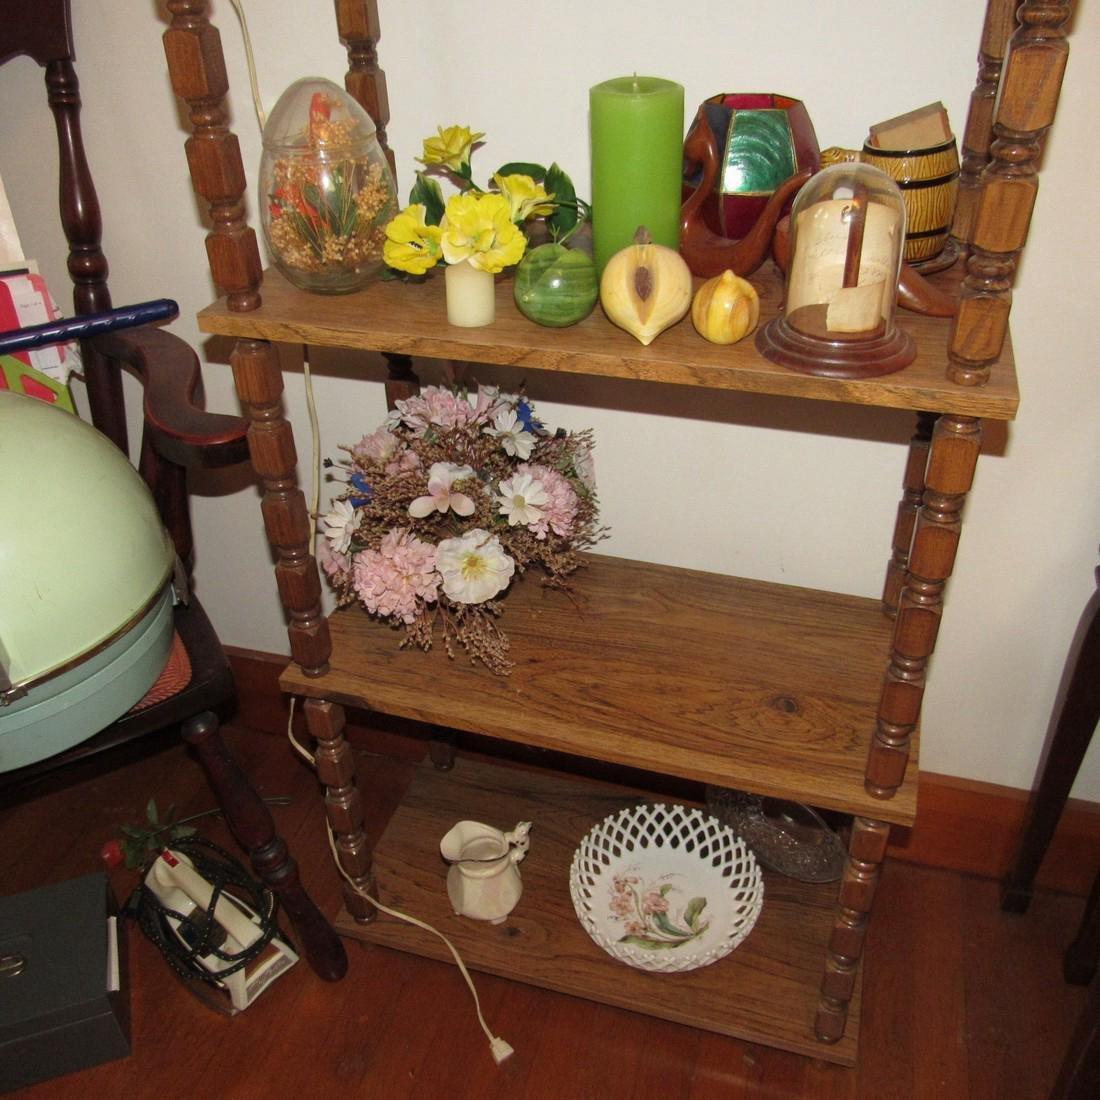 Shelf Chair Knick Knacks Glassware Lot - 4